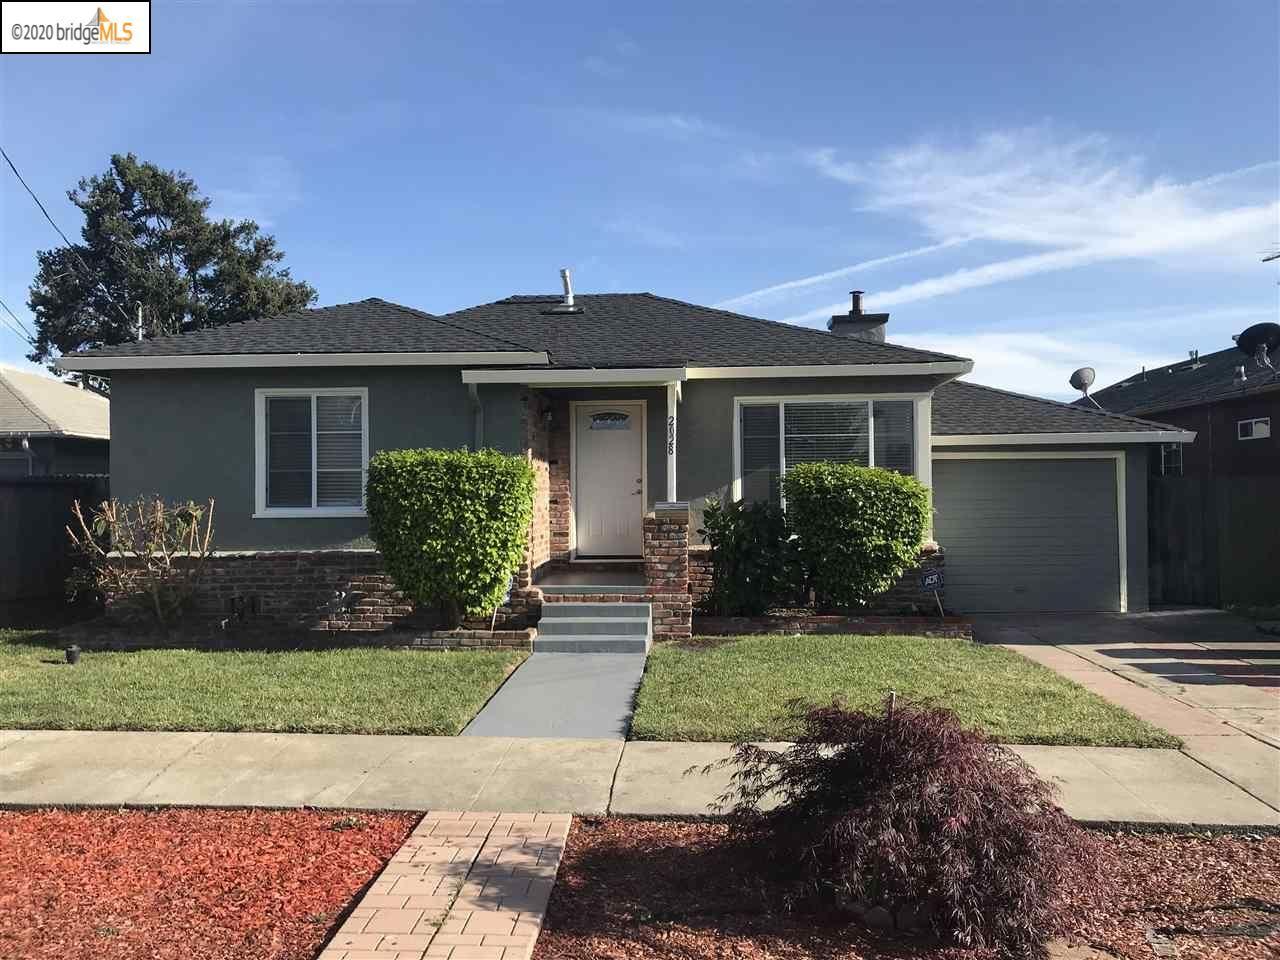 Photo for 2028 Coalinga Ave., RICHMOND, CA 94801 (MLS # 40896913)